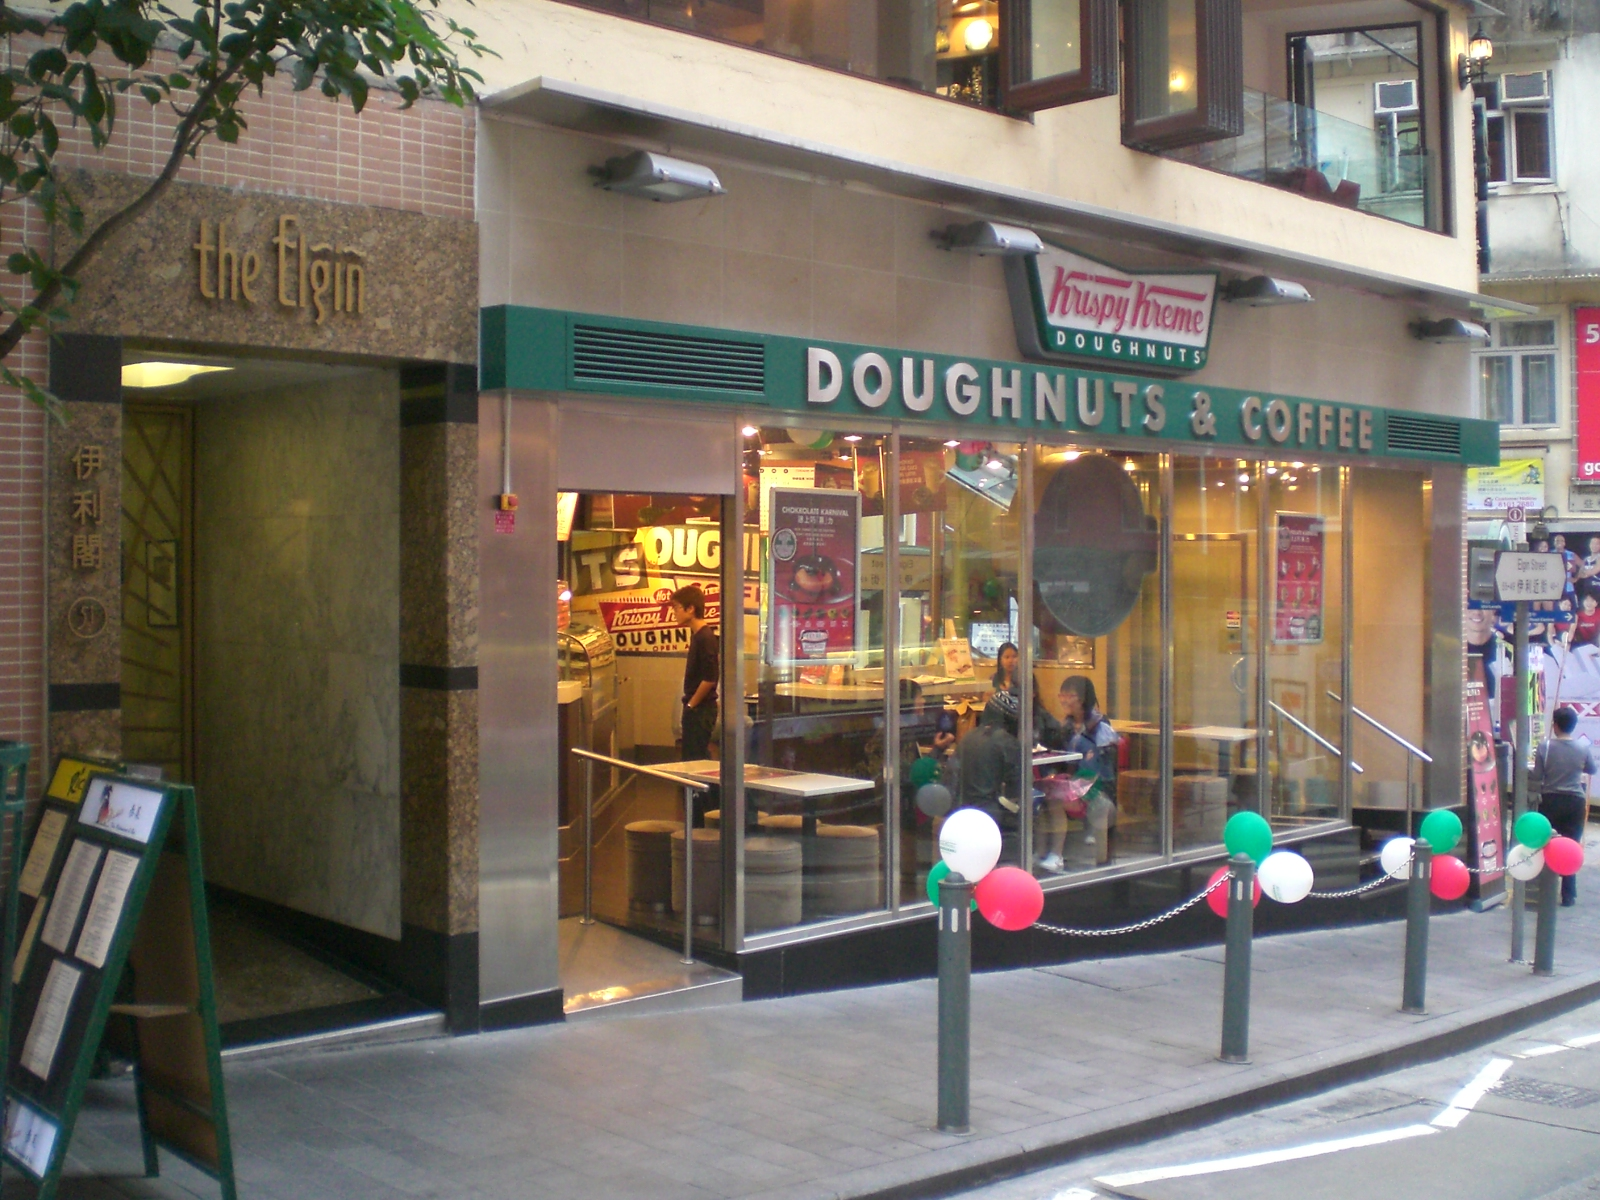 File:HK Central Elgin Street Krispy Kreme Doughnuts n Coffee Shop.JPG: commons.wikimedia.org/wiki/File:HK_Central_Elgin_Street_Krispy...